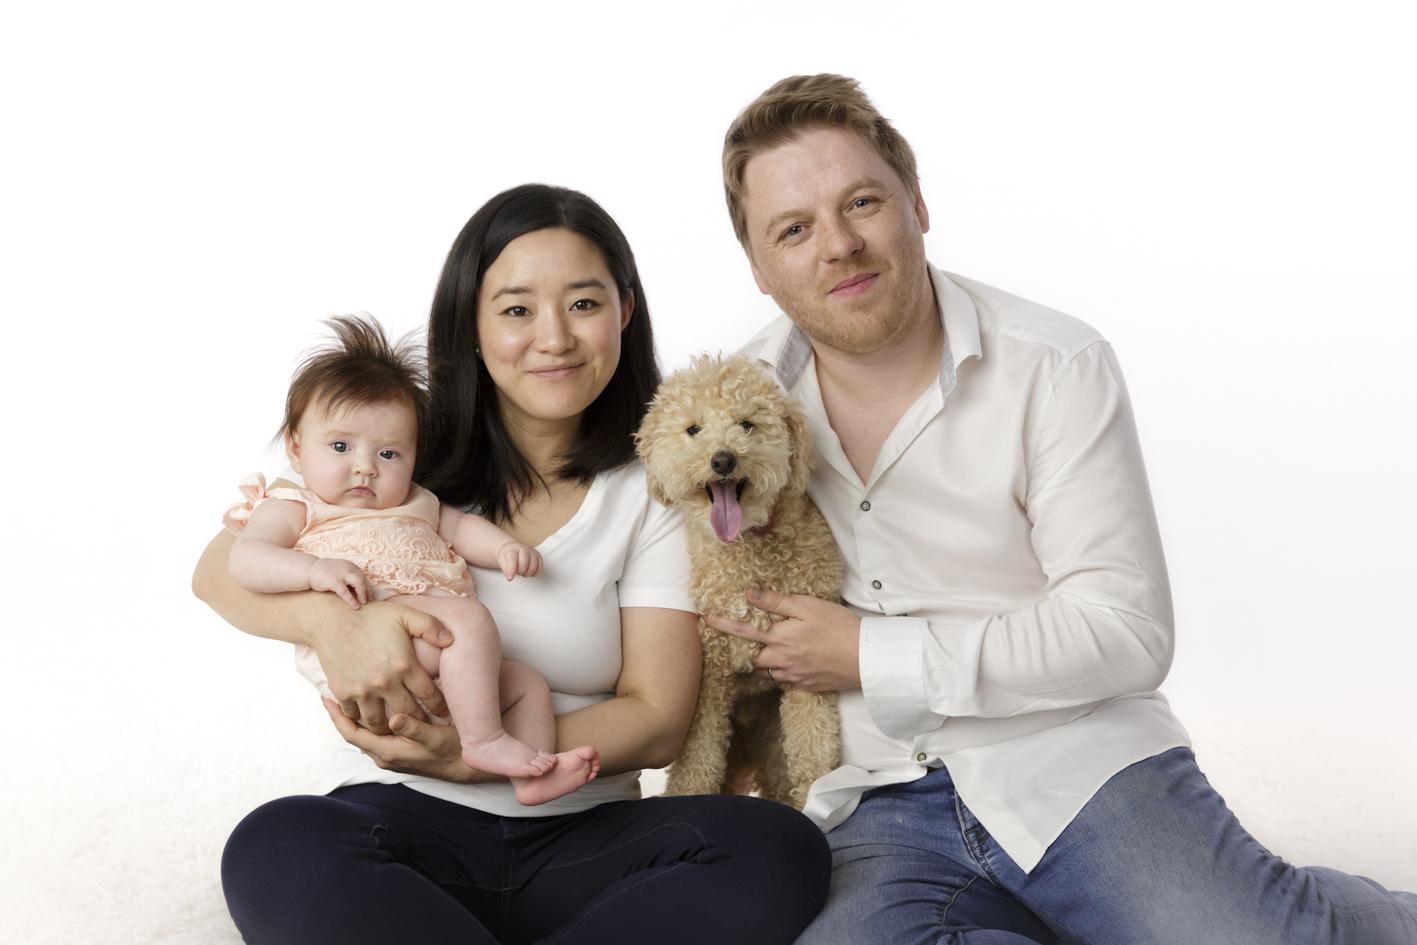 family baby photos including dog